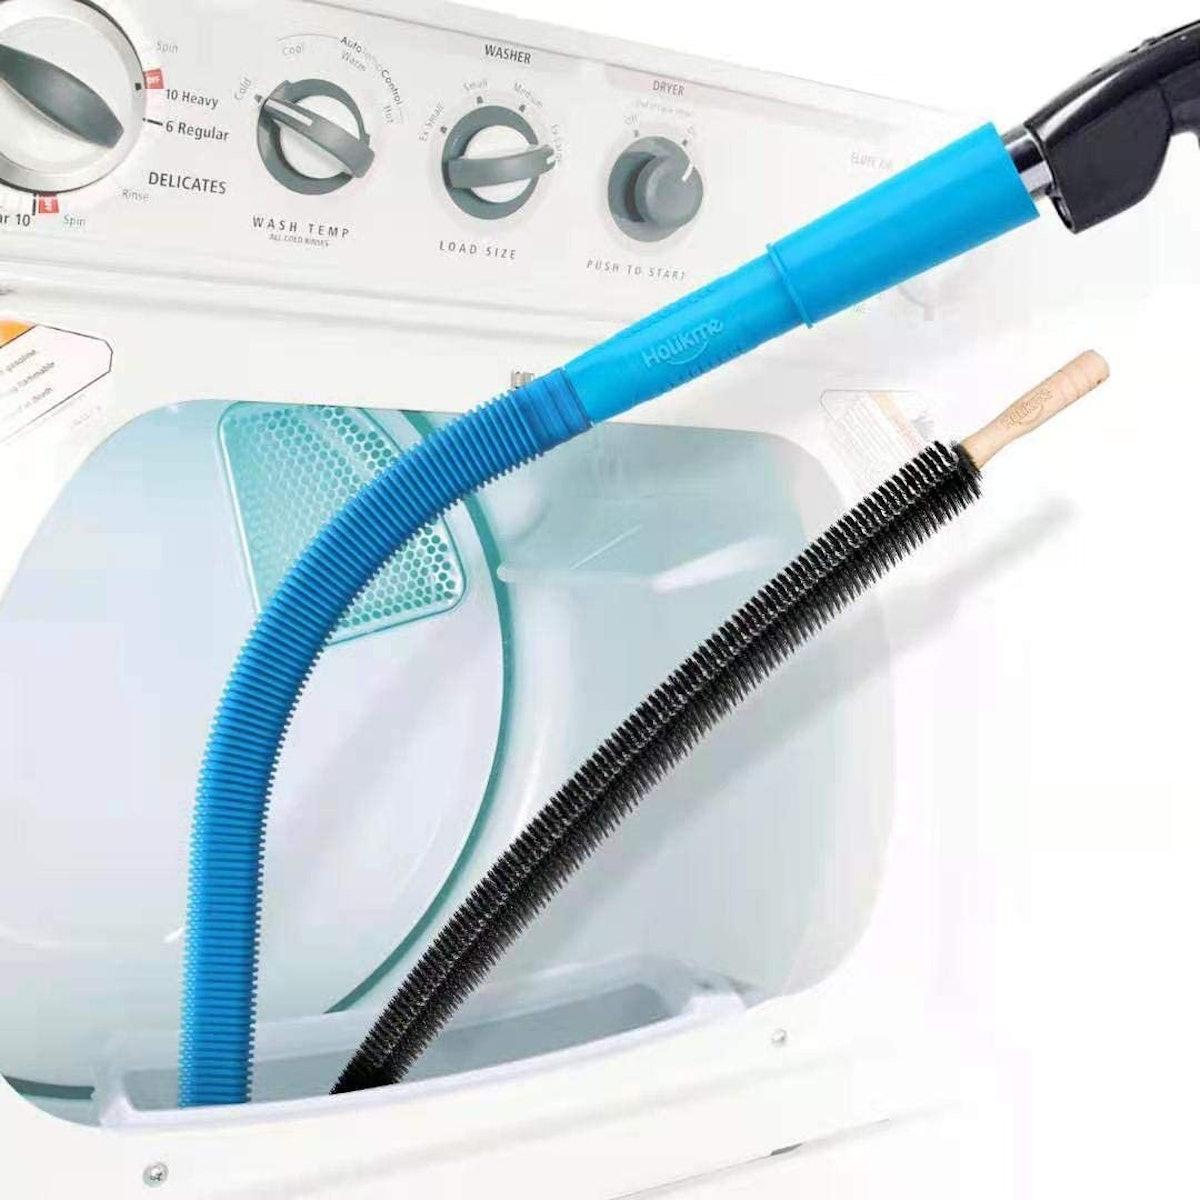 Holikme Dryer Lint Vacuum Attachment (2 Pack)